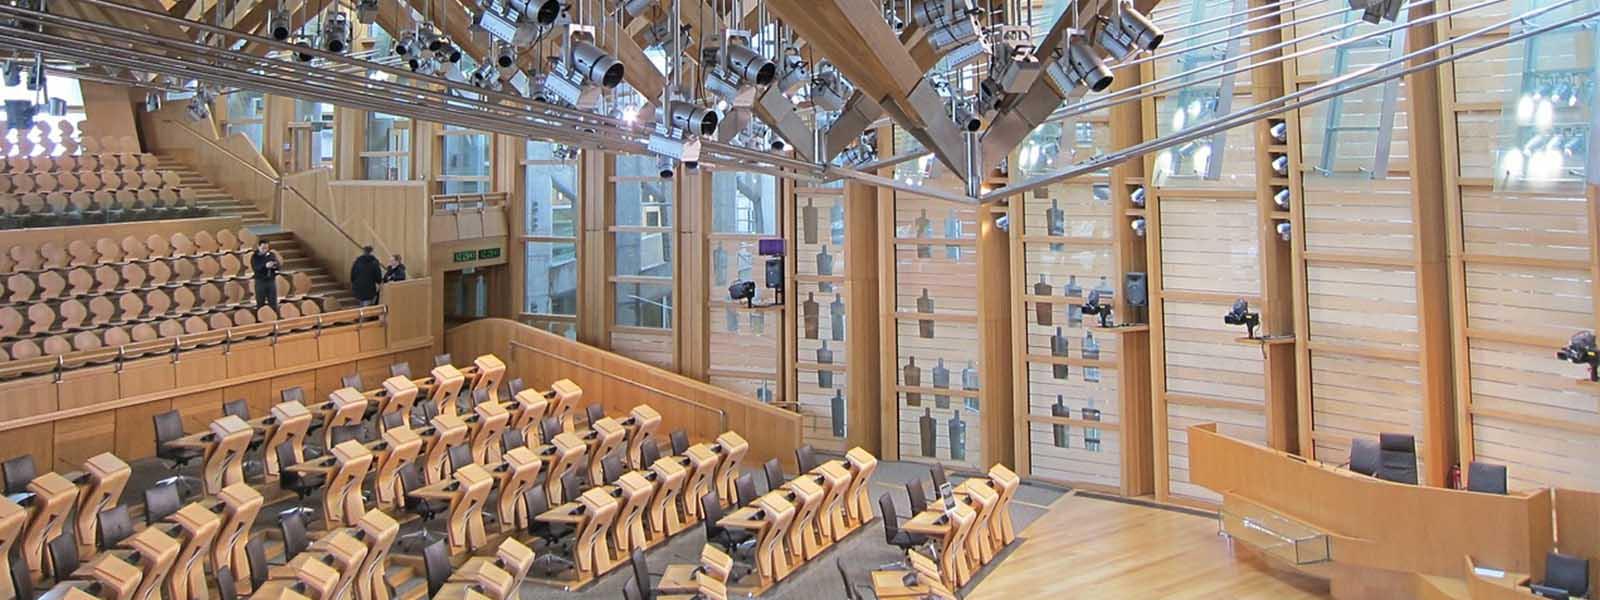 Inside Scottish Parliament